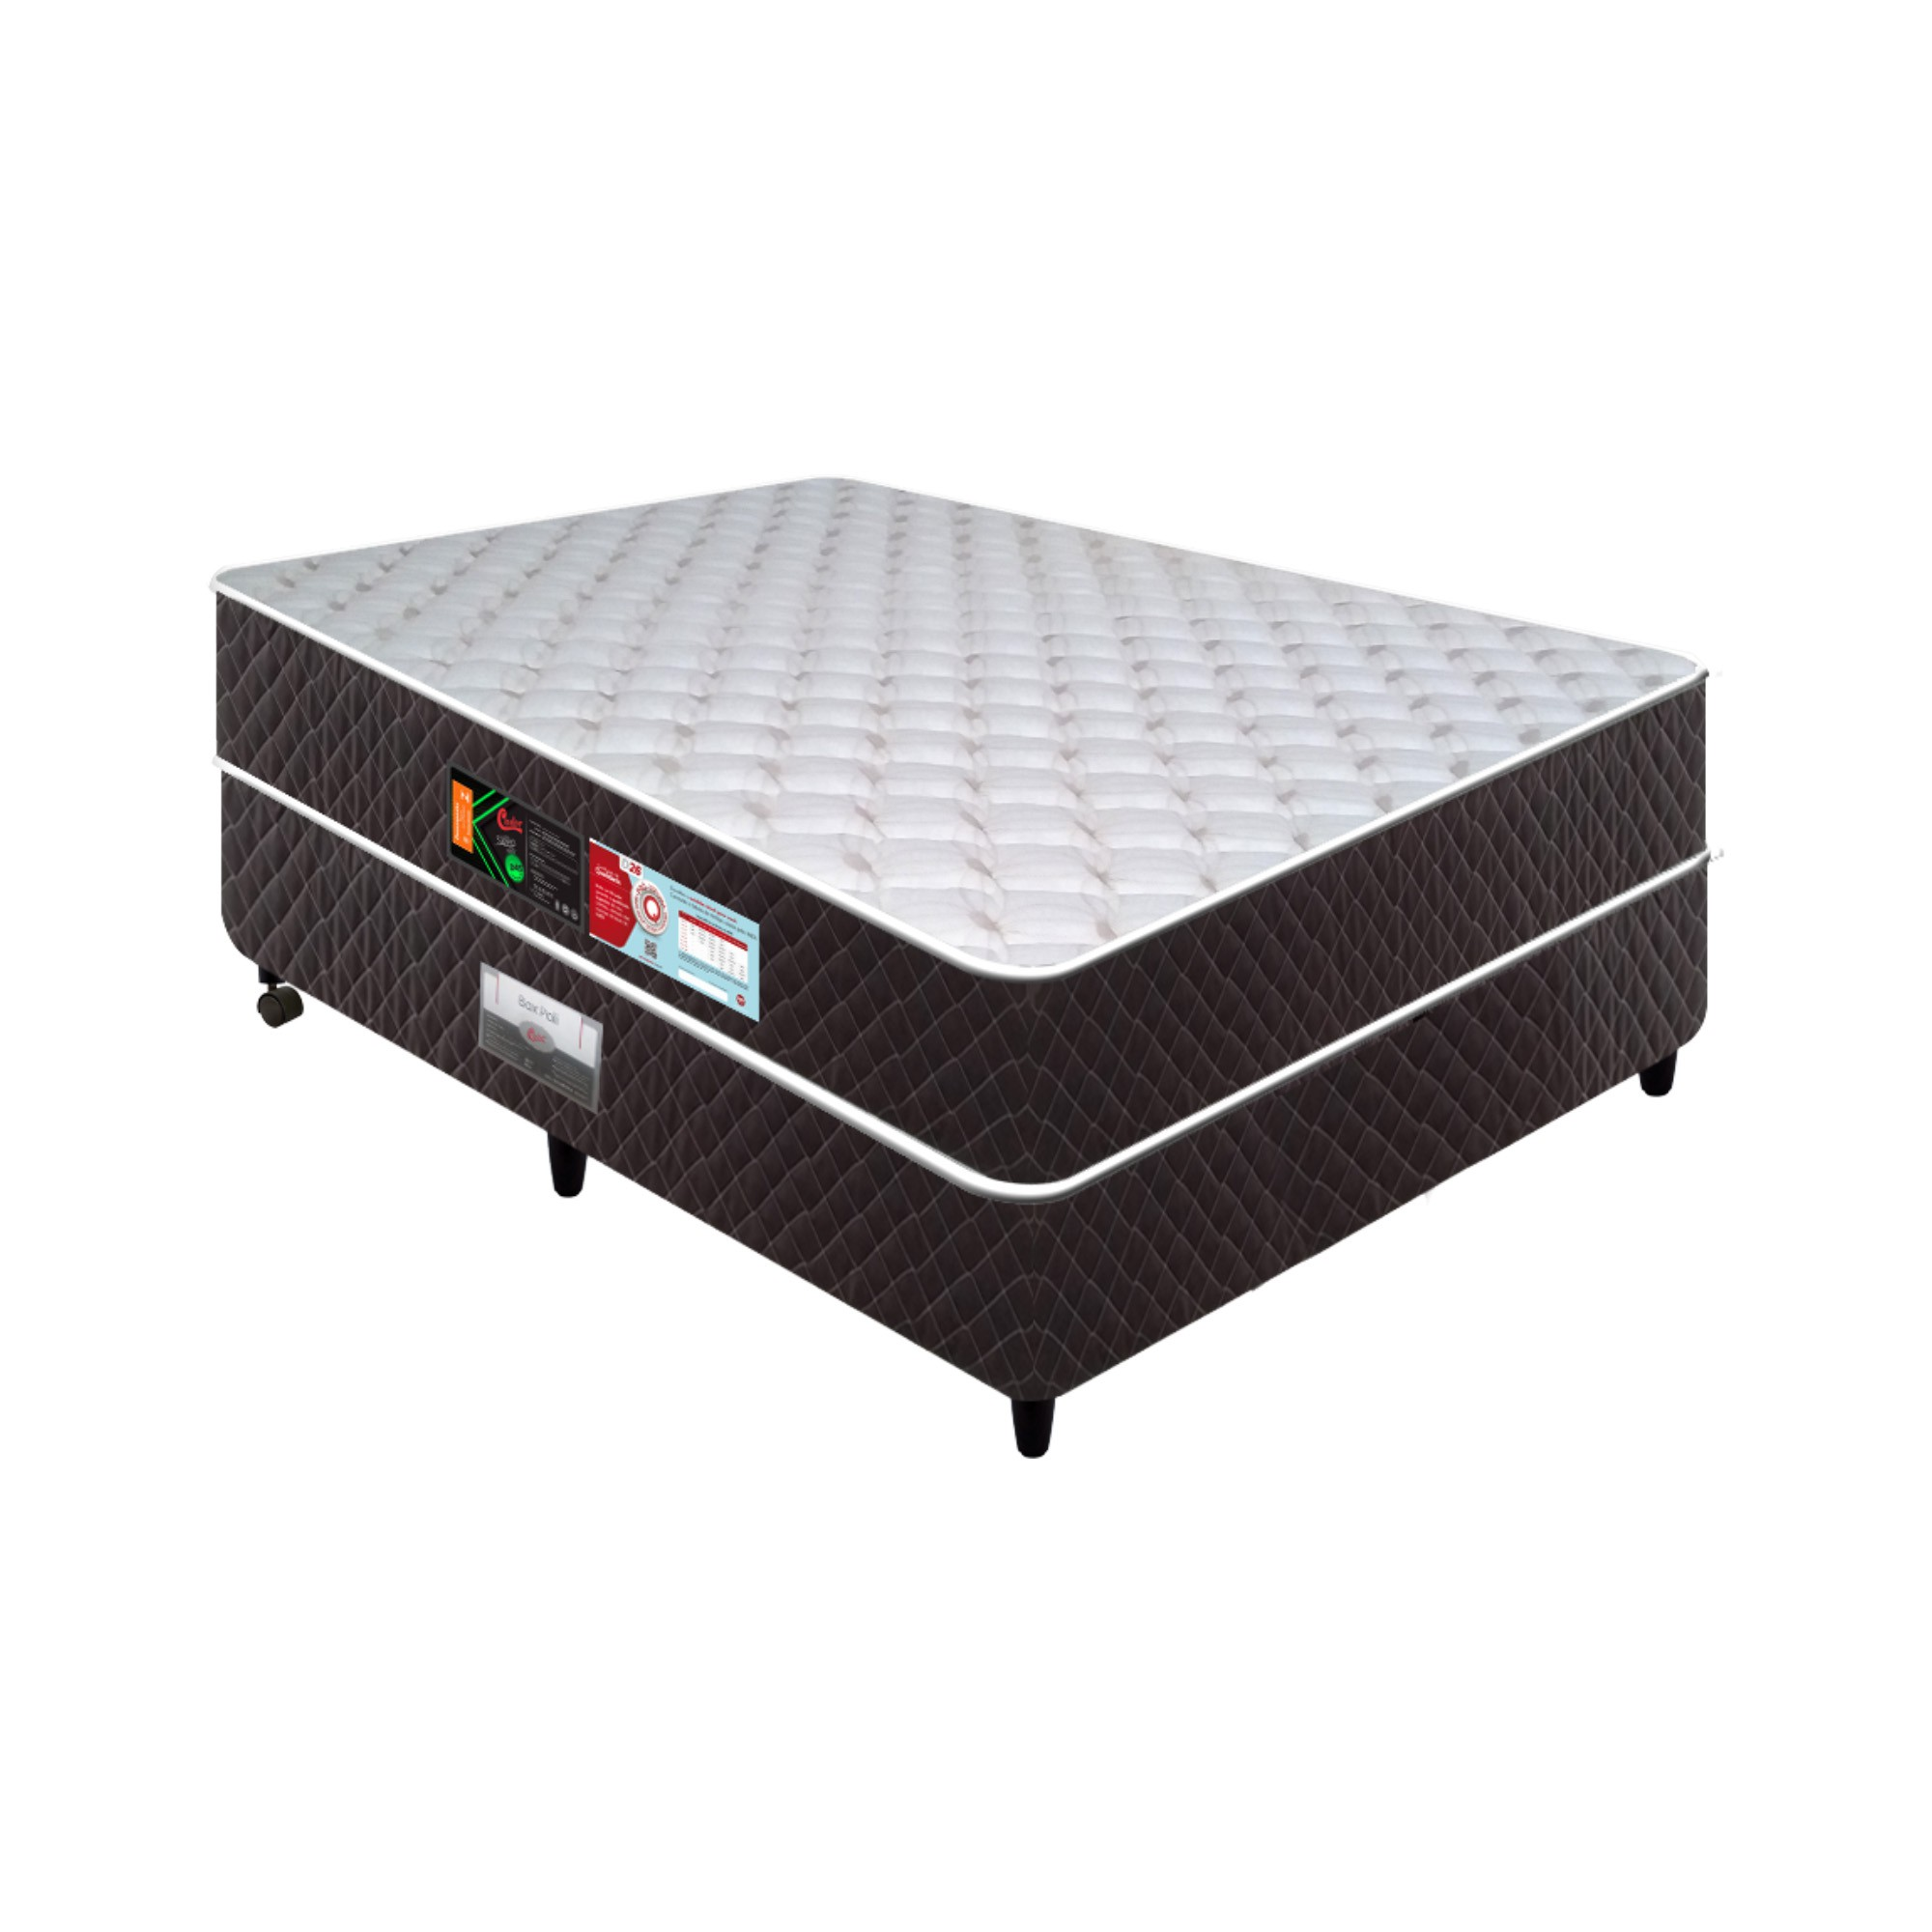 Conjunto Box Castor Sleep Max D28 [Solteiro 078 x 188 cm]